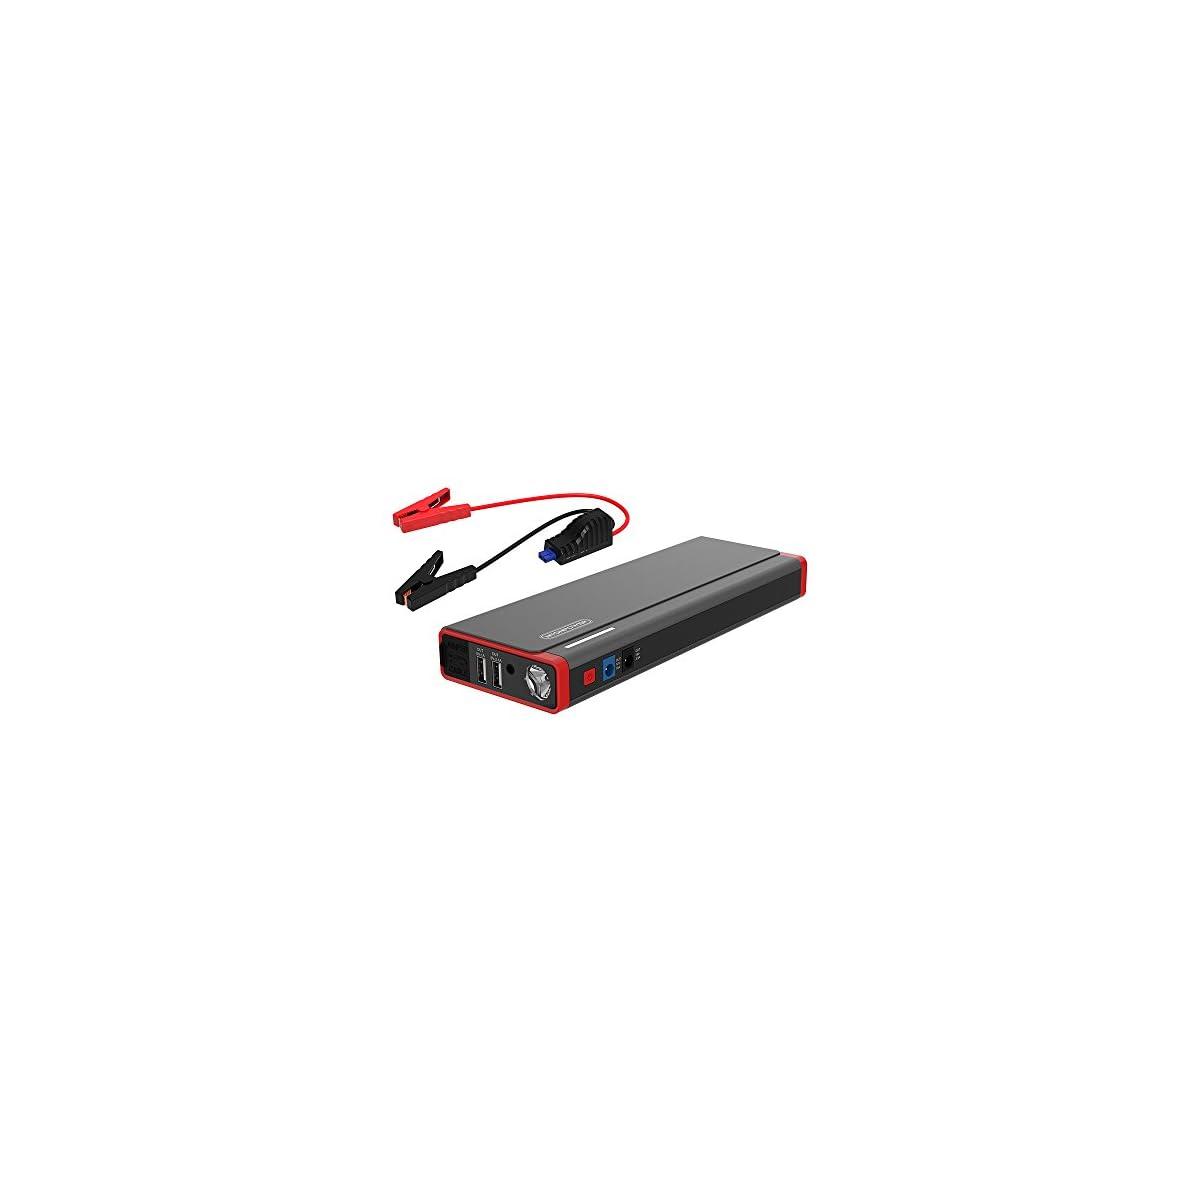 41o7EZw0M%2BL. SS1200  - Arrancador de Coche de 18000mAh 800A Pico (8 L Gas o motores Diesel 6 L ) con Batería Externa Recargable, Arranque Kit para Coche,LED Flashlight,Con Pinzas Inteligentes,Dual USB Puertos para Smartphones,Tablets-Gris